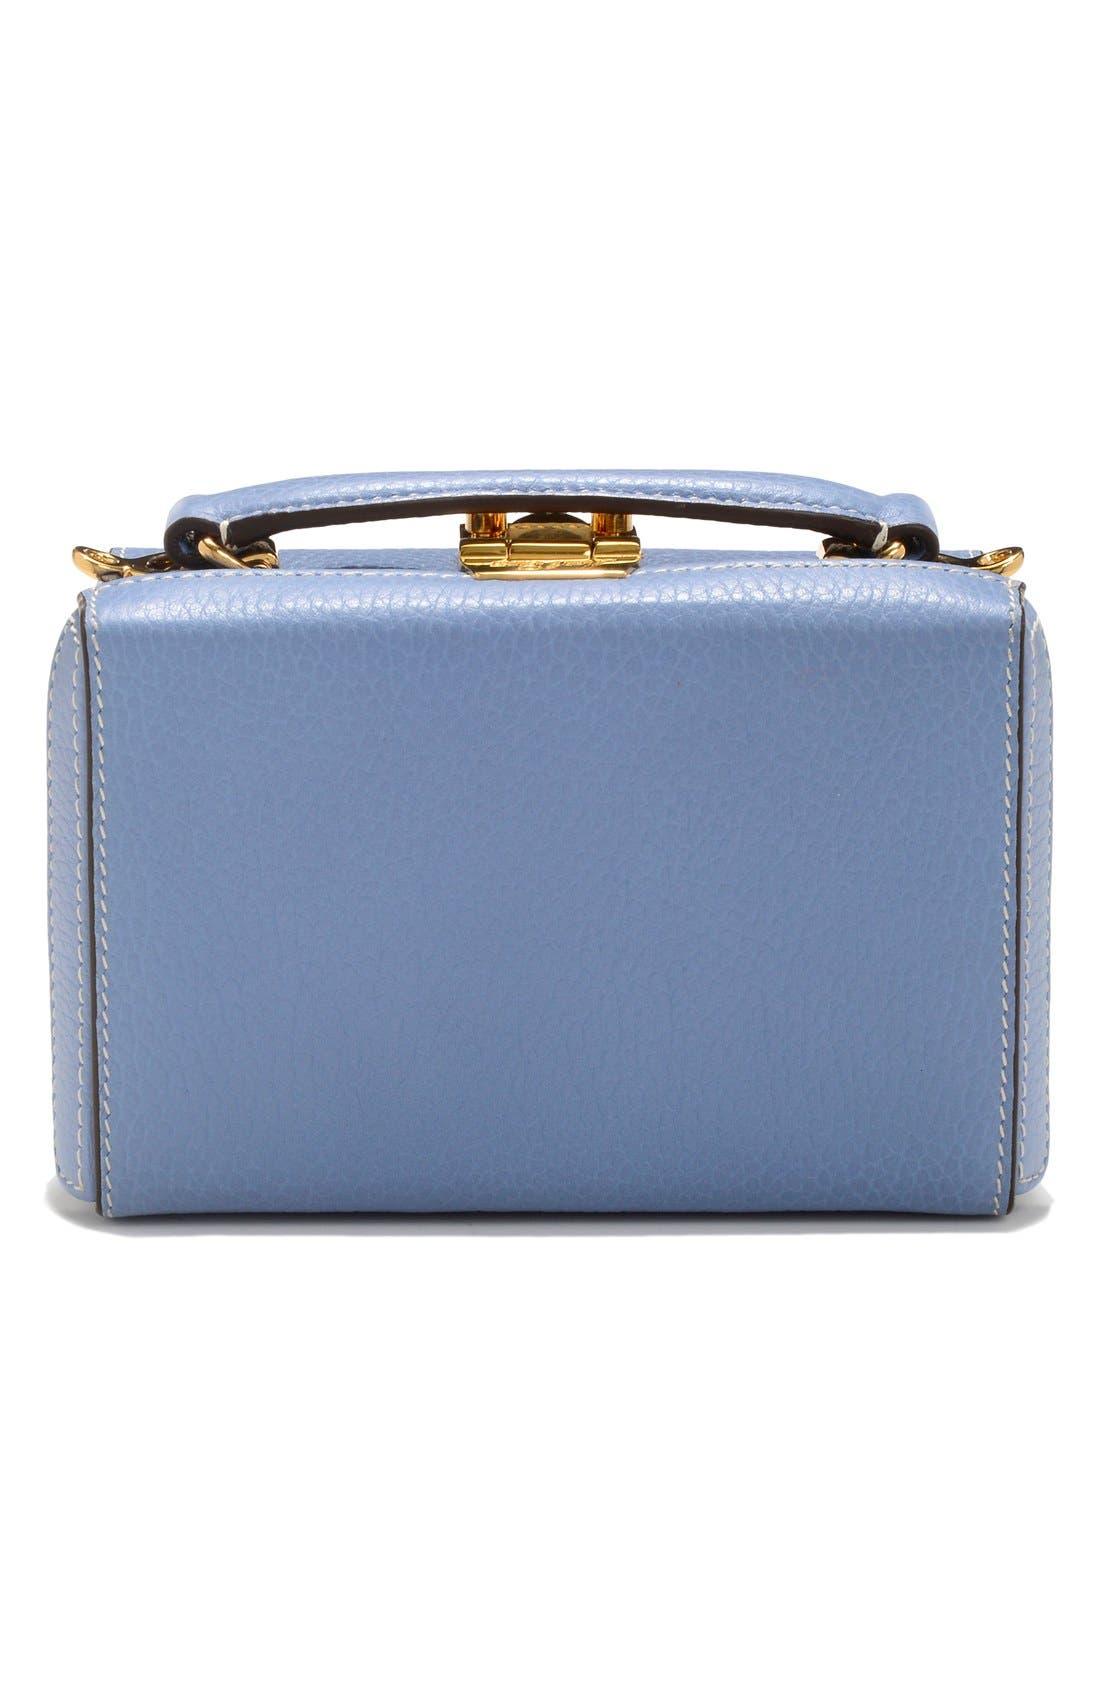 Alternate Image 2  - Mark Cross 'Mini Grace' Pebbled Leather Box Bag